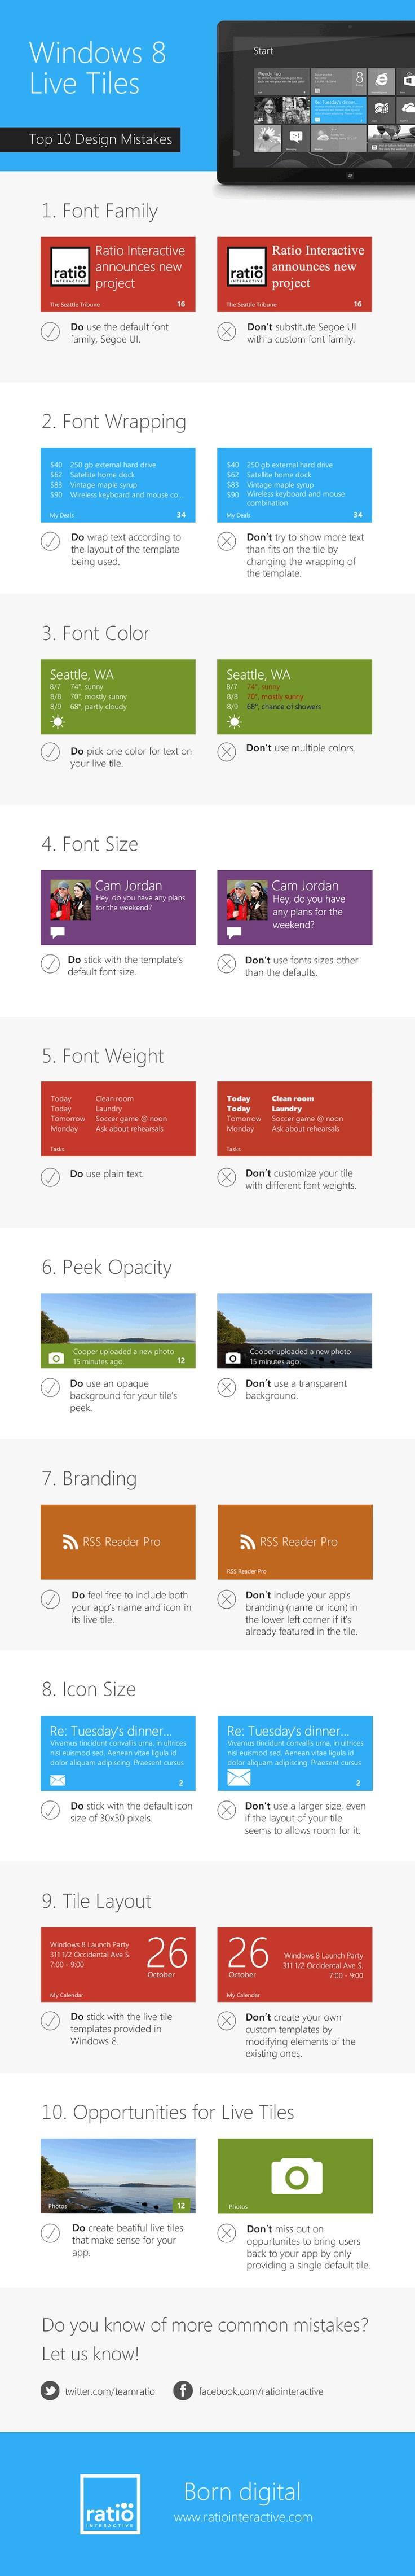 Windows 8 Live Tiles: Top 10 Design Mistakes